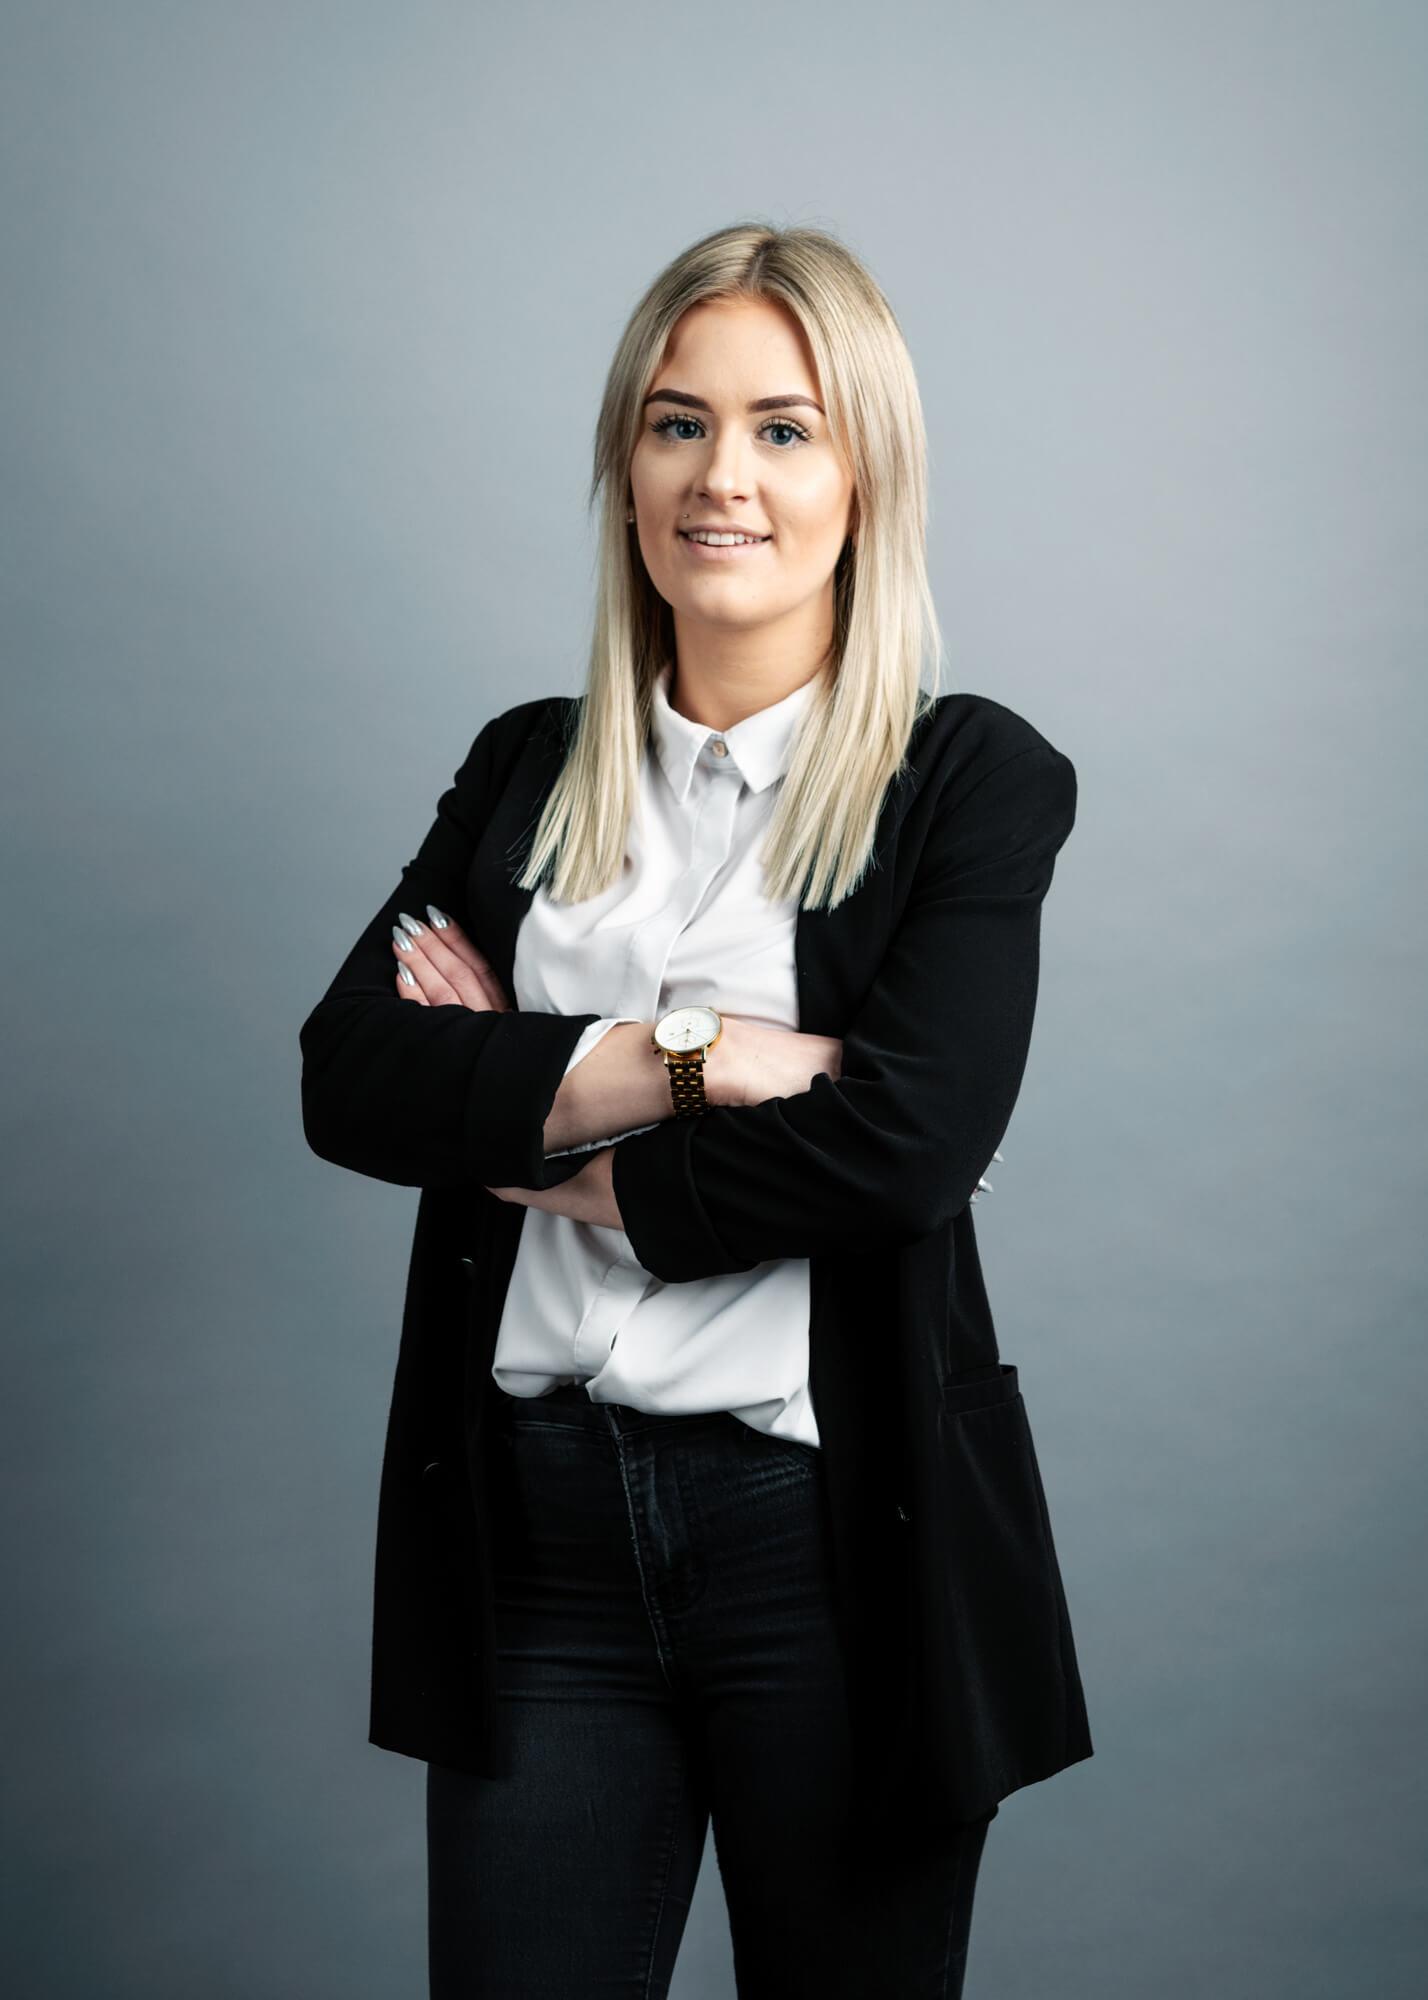 Daniela Berghofer